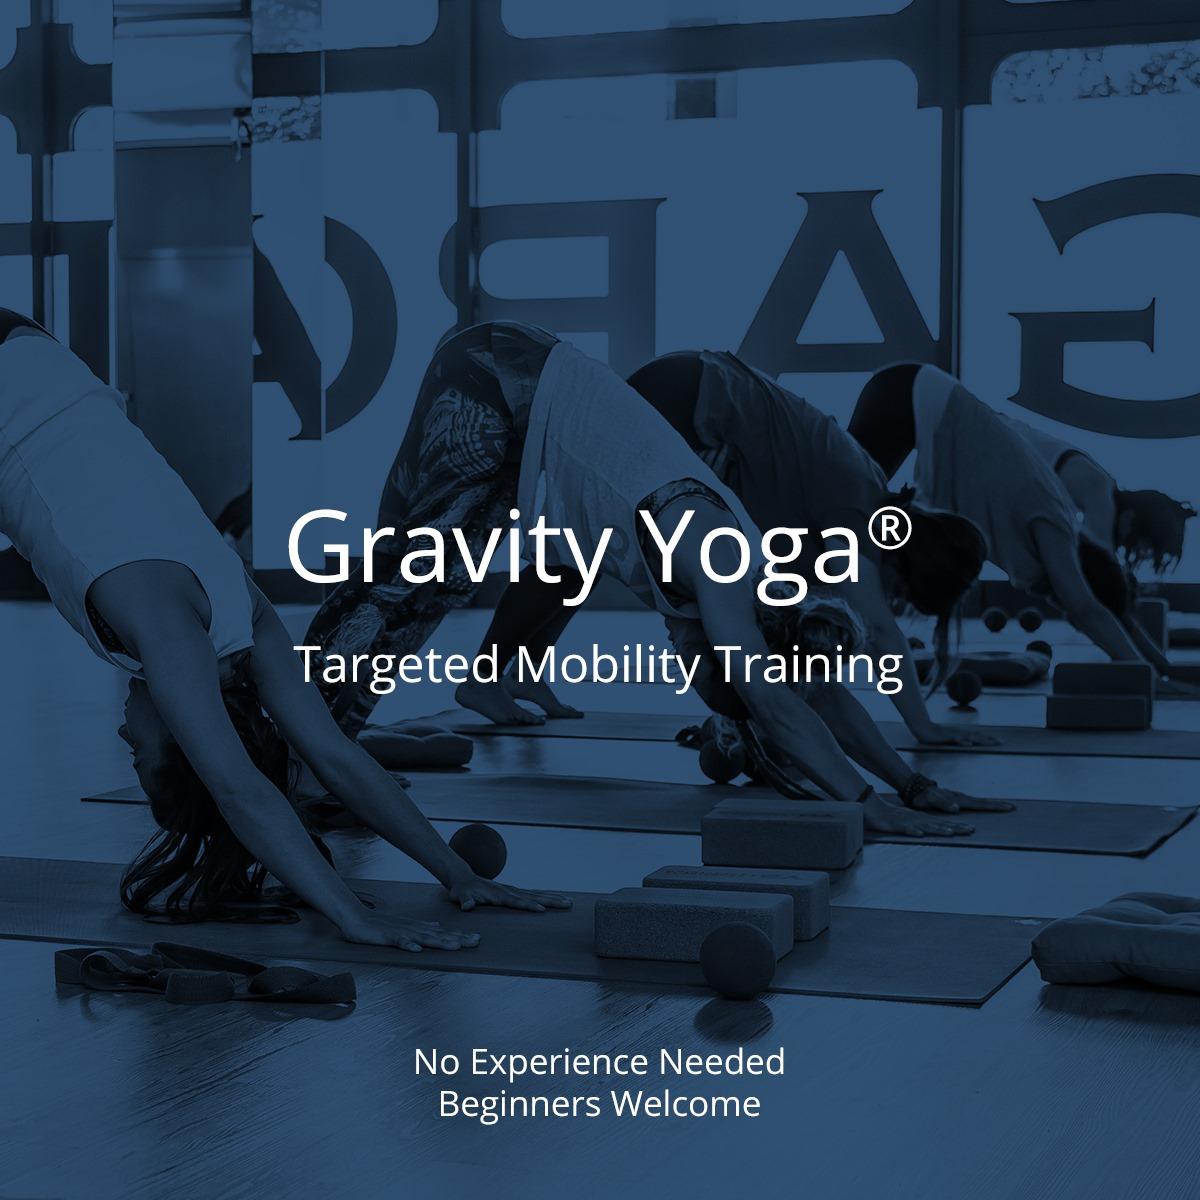 Gravity Yoga